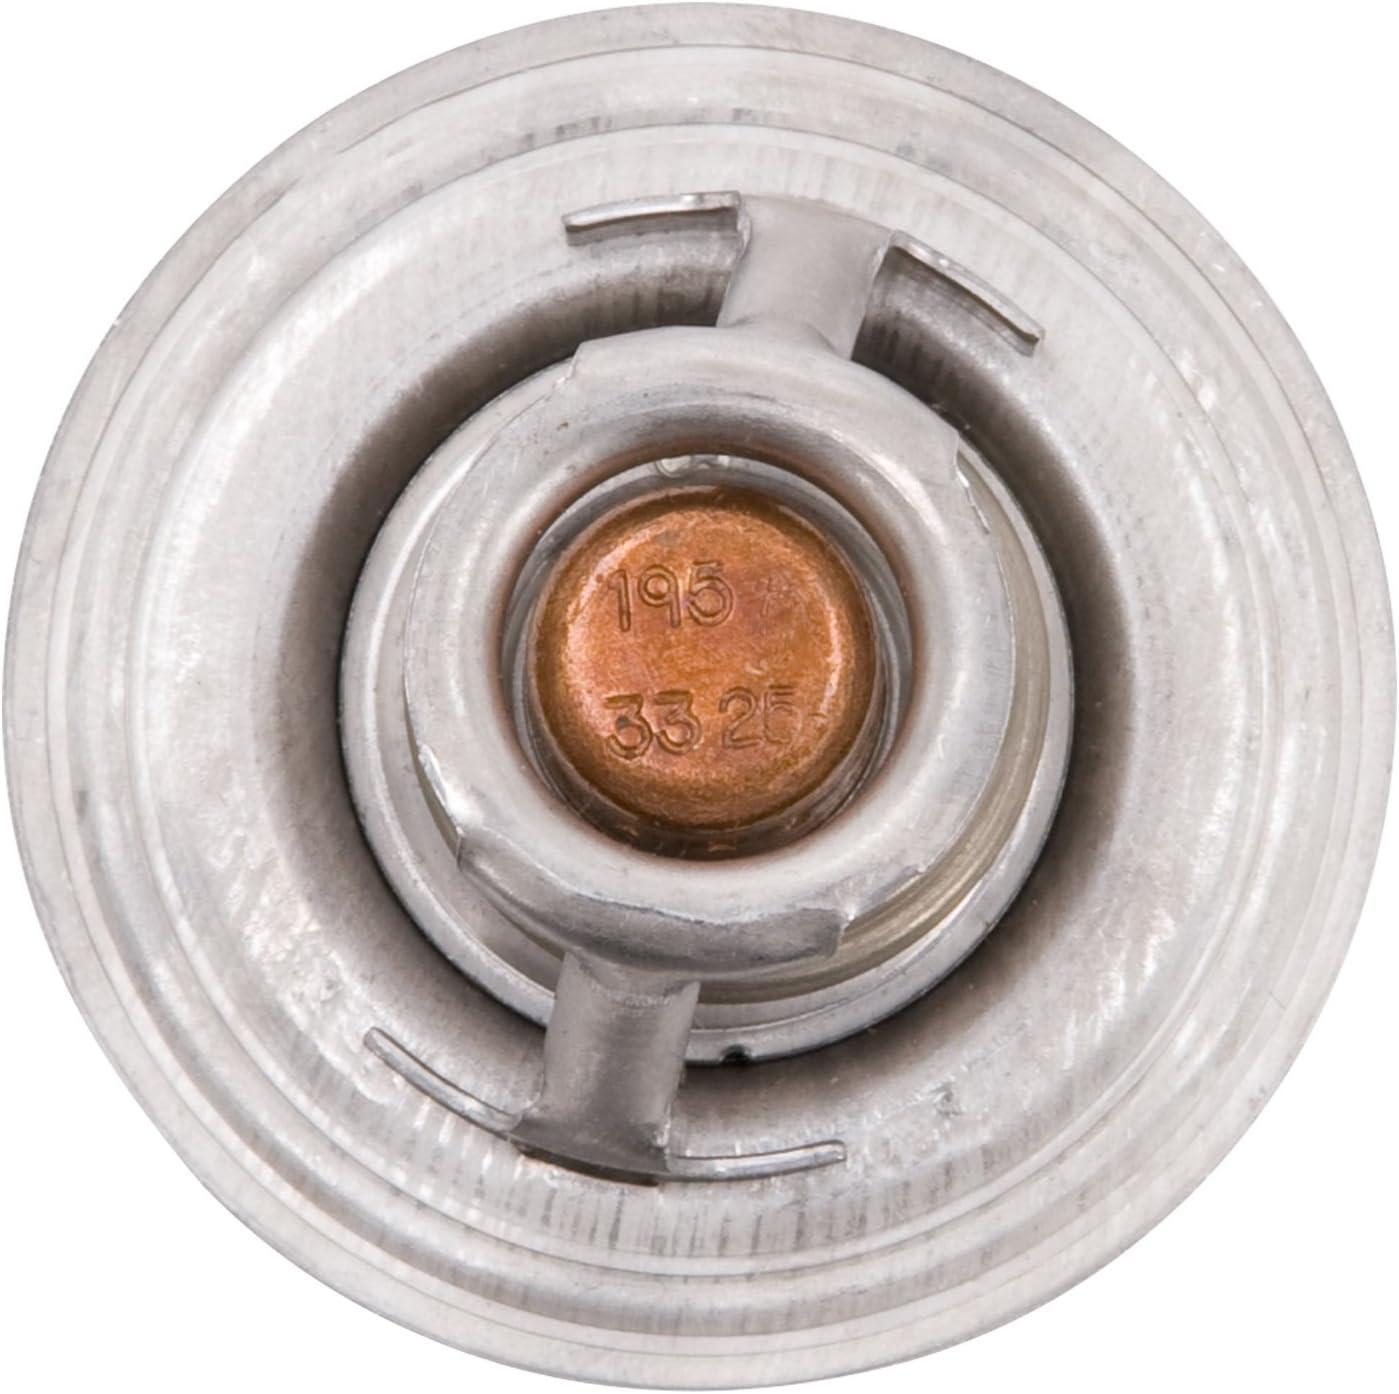 Edelbrock 8605 High Flow Thermostat 053 mm / 2 3/32 in. 195 Deg. High Flow Thermostat